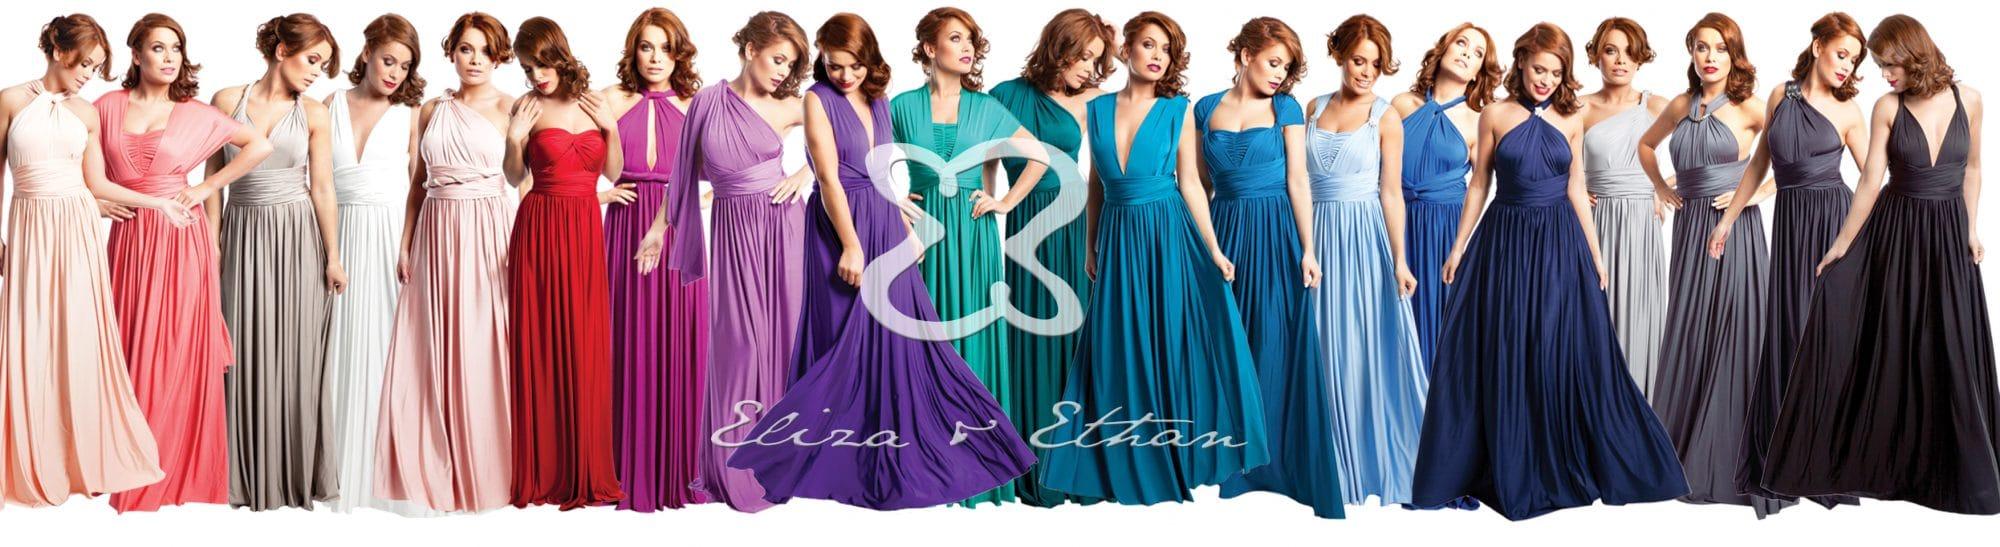 Azalea eliza ethan multi wrap dress alila a dress for all occasions ombrellifo Image collections